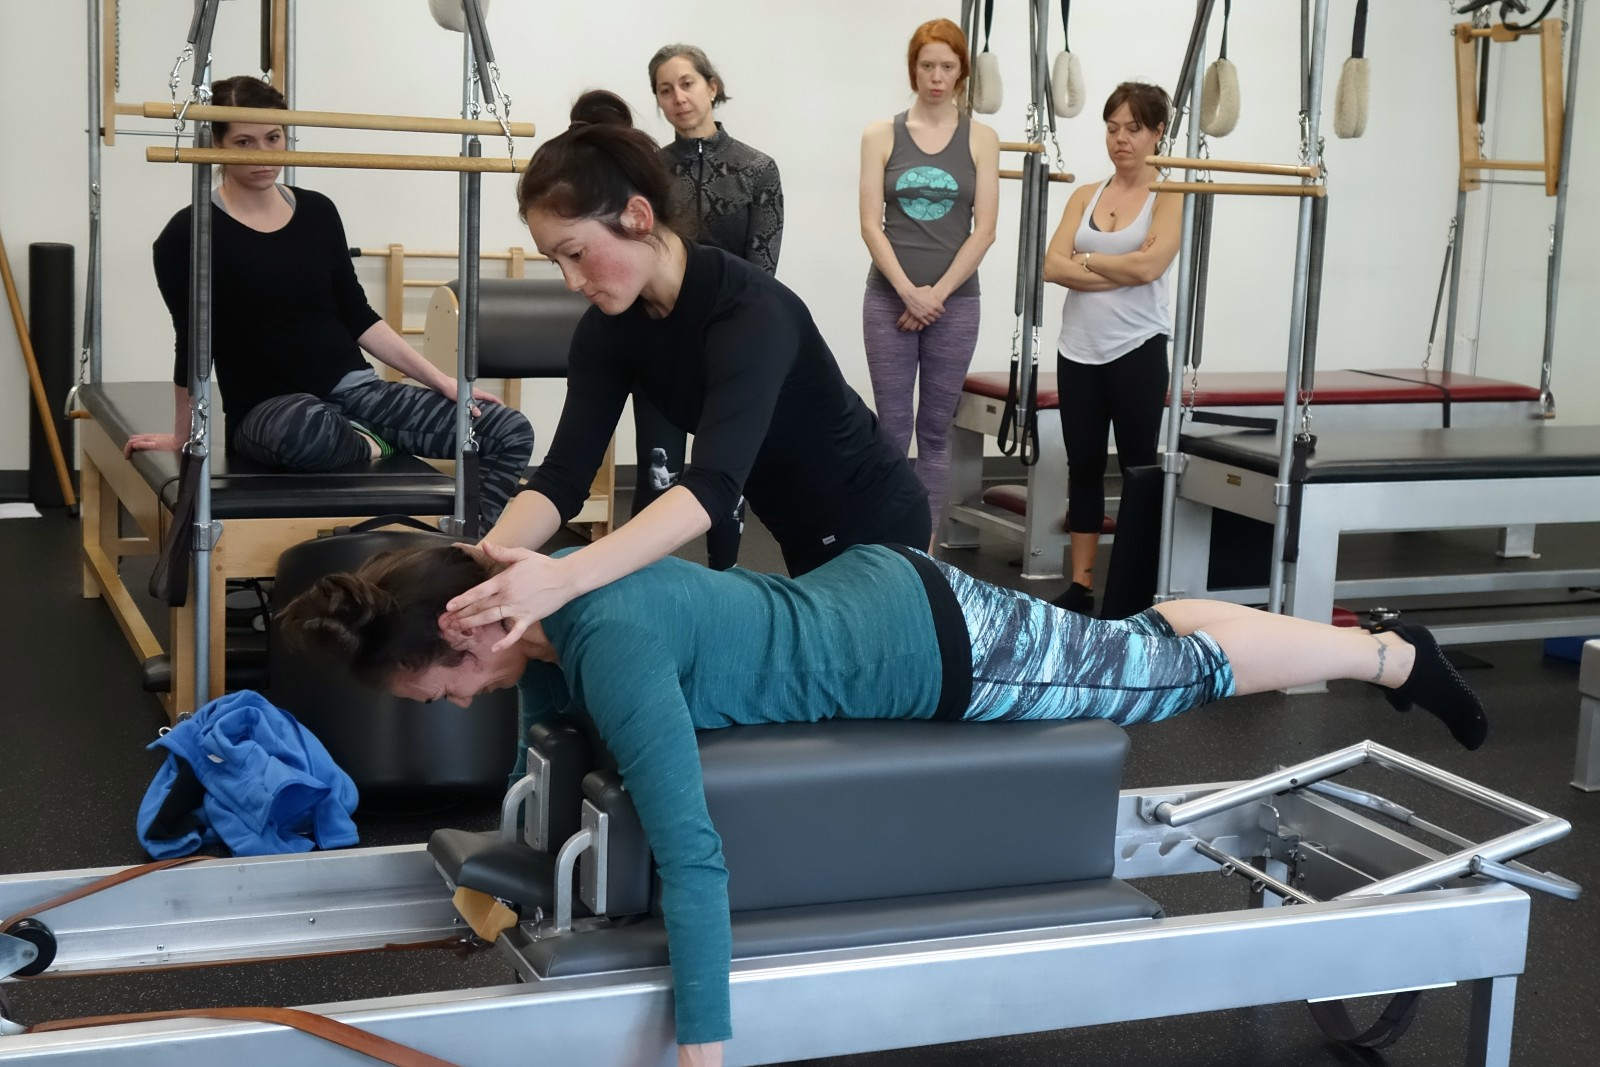 Mia demonstrates Pilates tactile correction